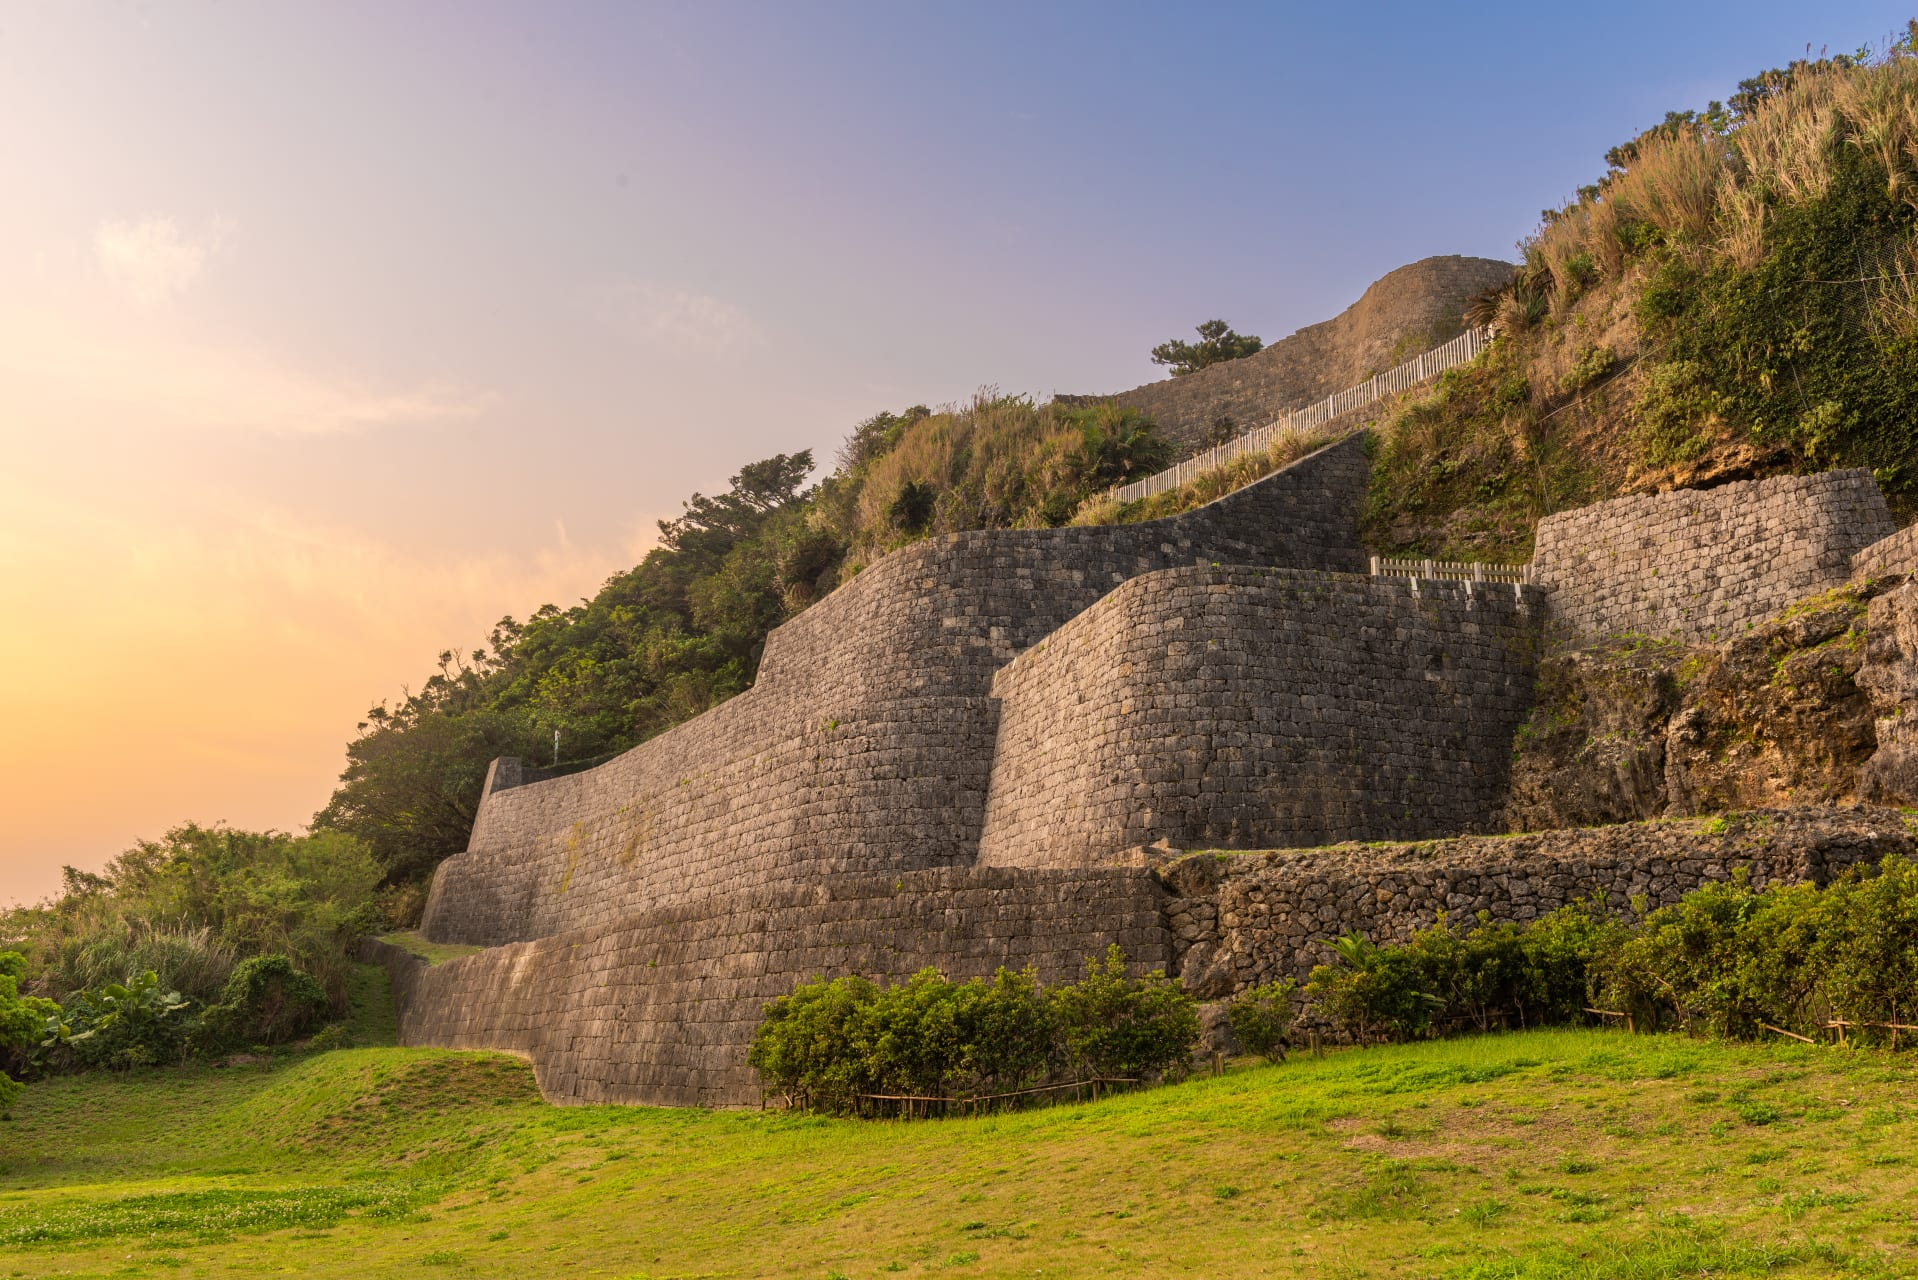 Okinawa - Hacksaw Ridge - The most famous WW2 battlefield in Okinawa